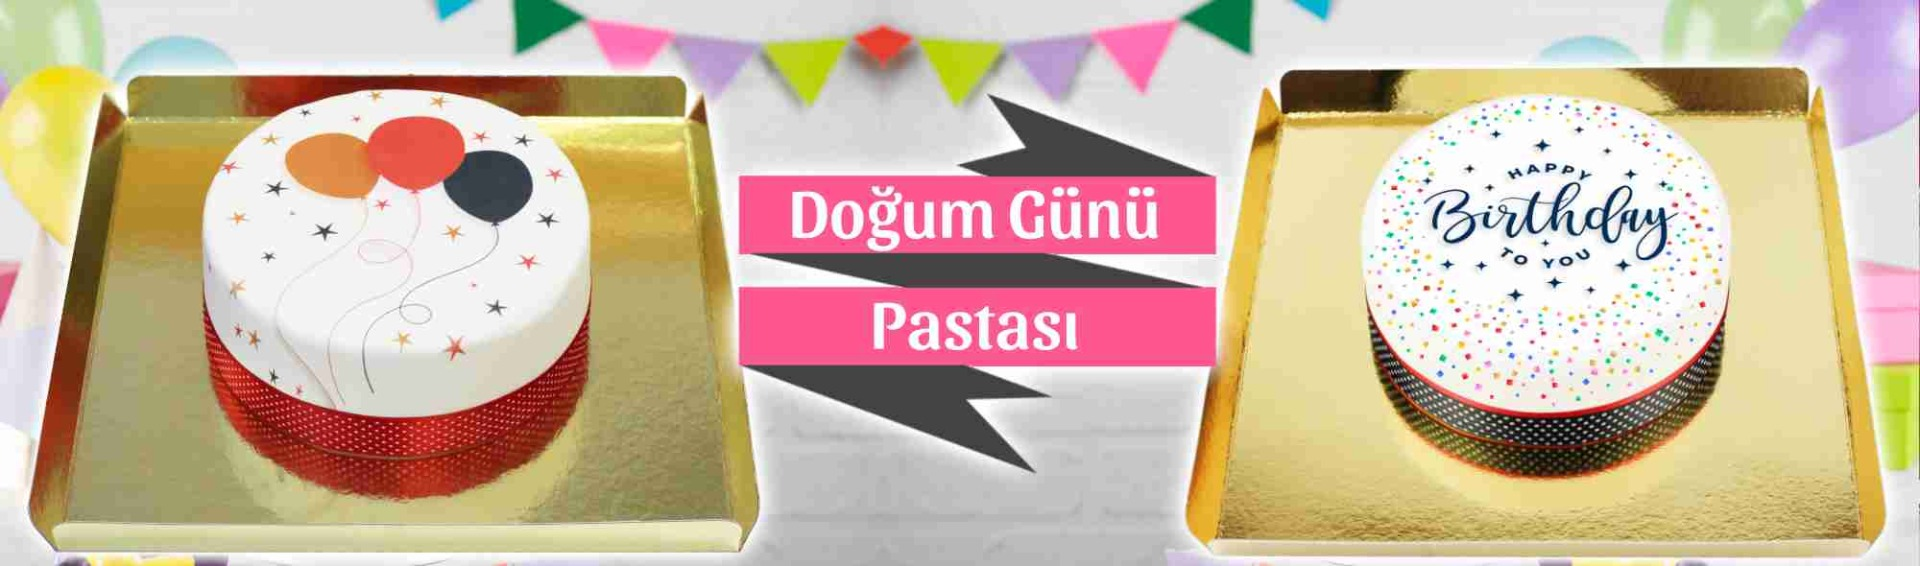 dogum-gunu-pasta